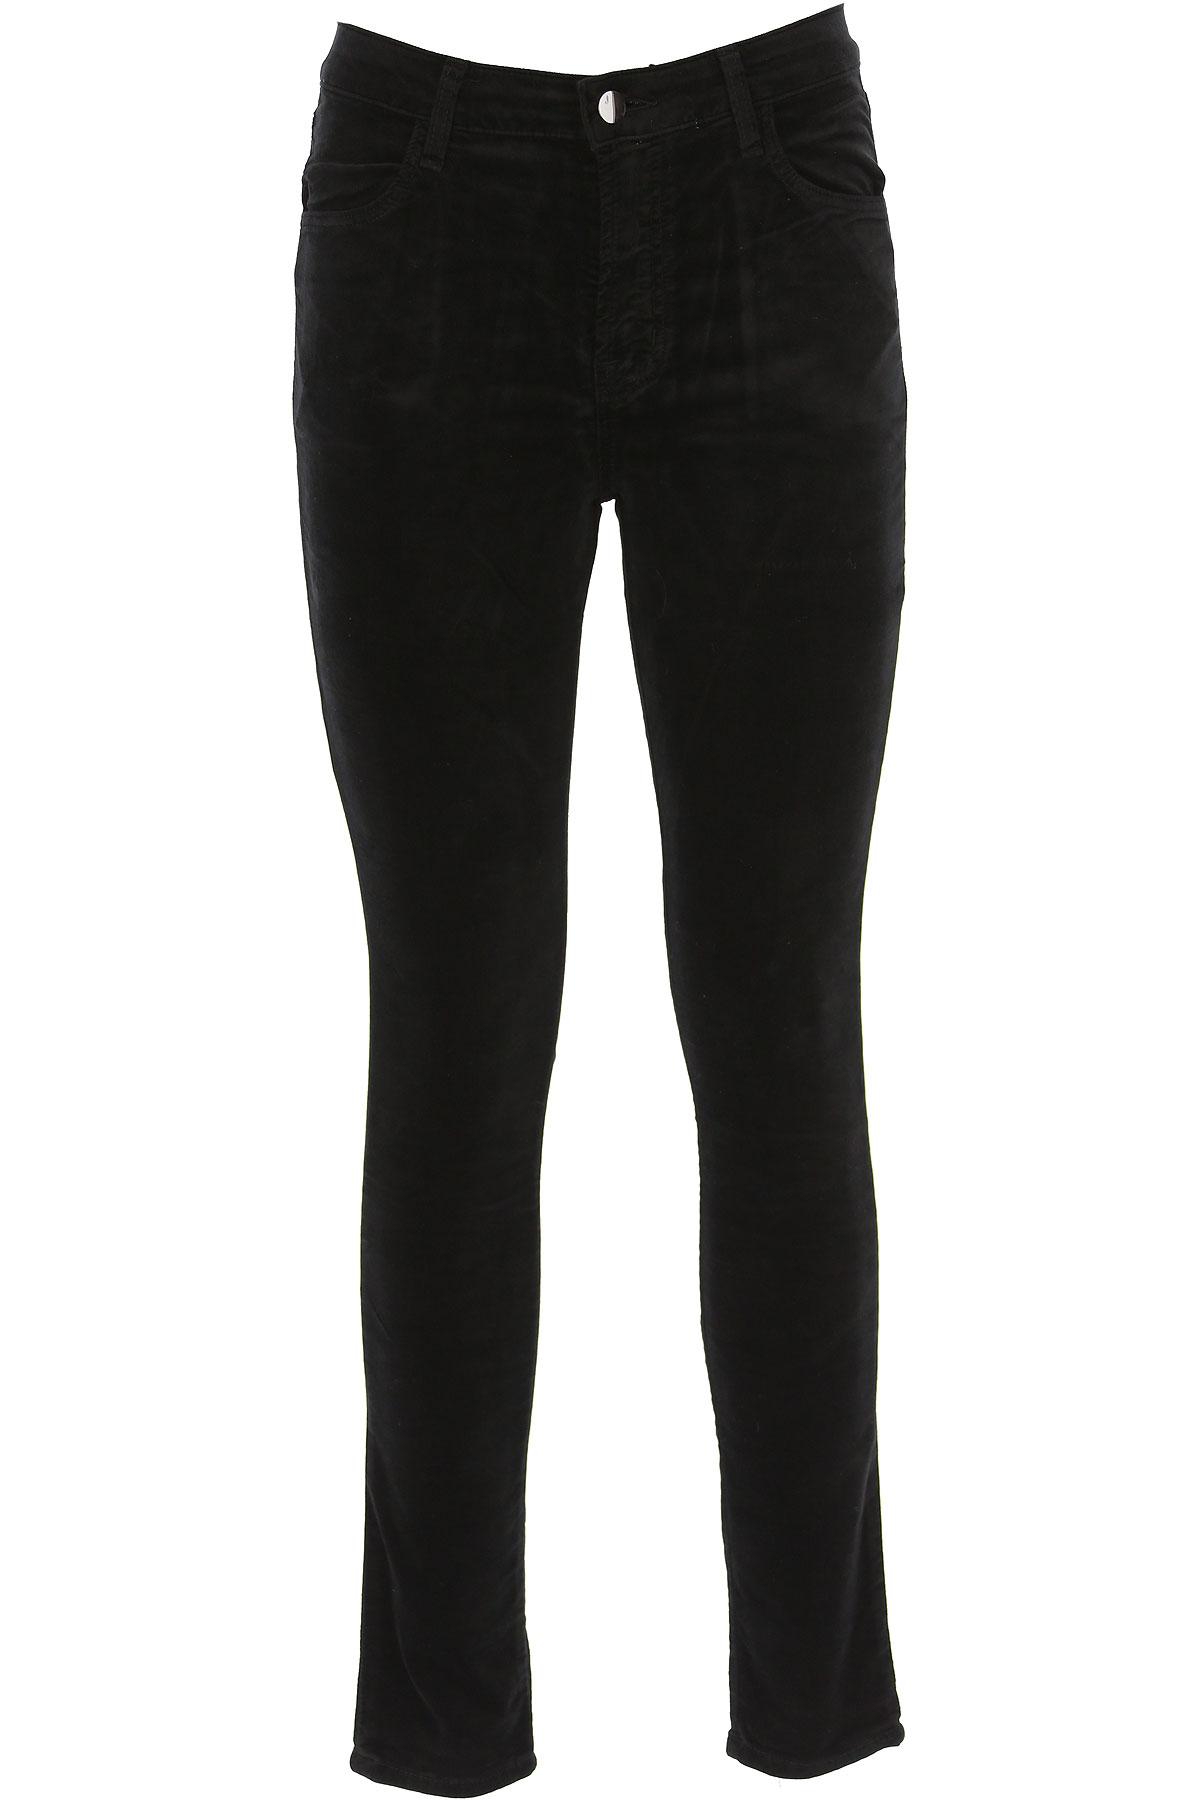 J Brand Pants for Women On Sale, Black, Cotton, 2019, 25 27 29 30